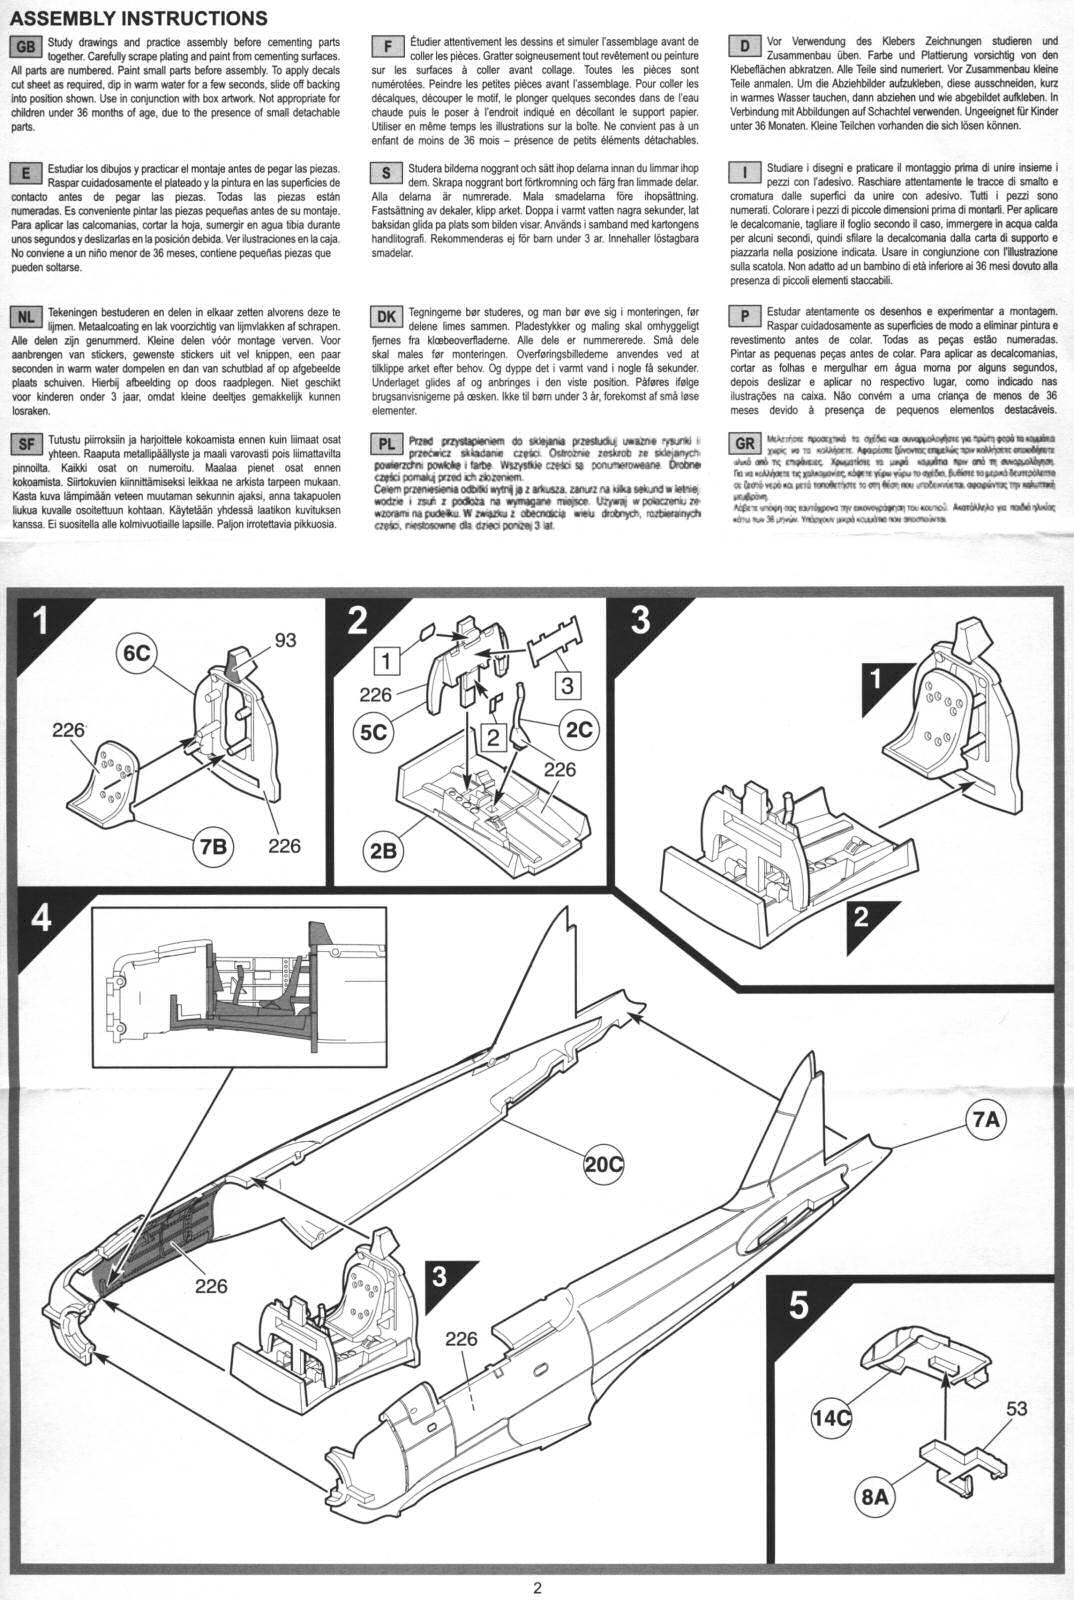 3eb2b8a5 Airfix 1/72 Mitsubishi A6M2 Zero (A01005) - - The Airfix Tribute Forum -